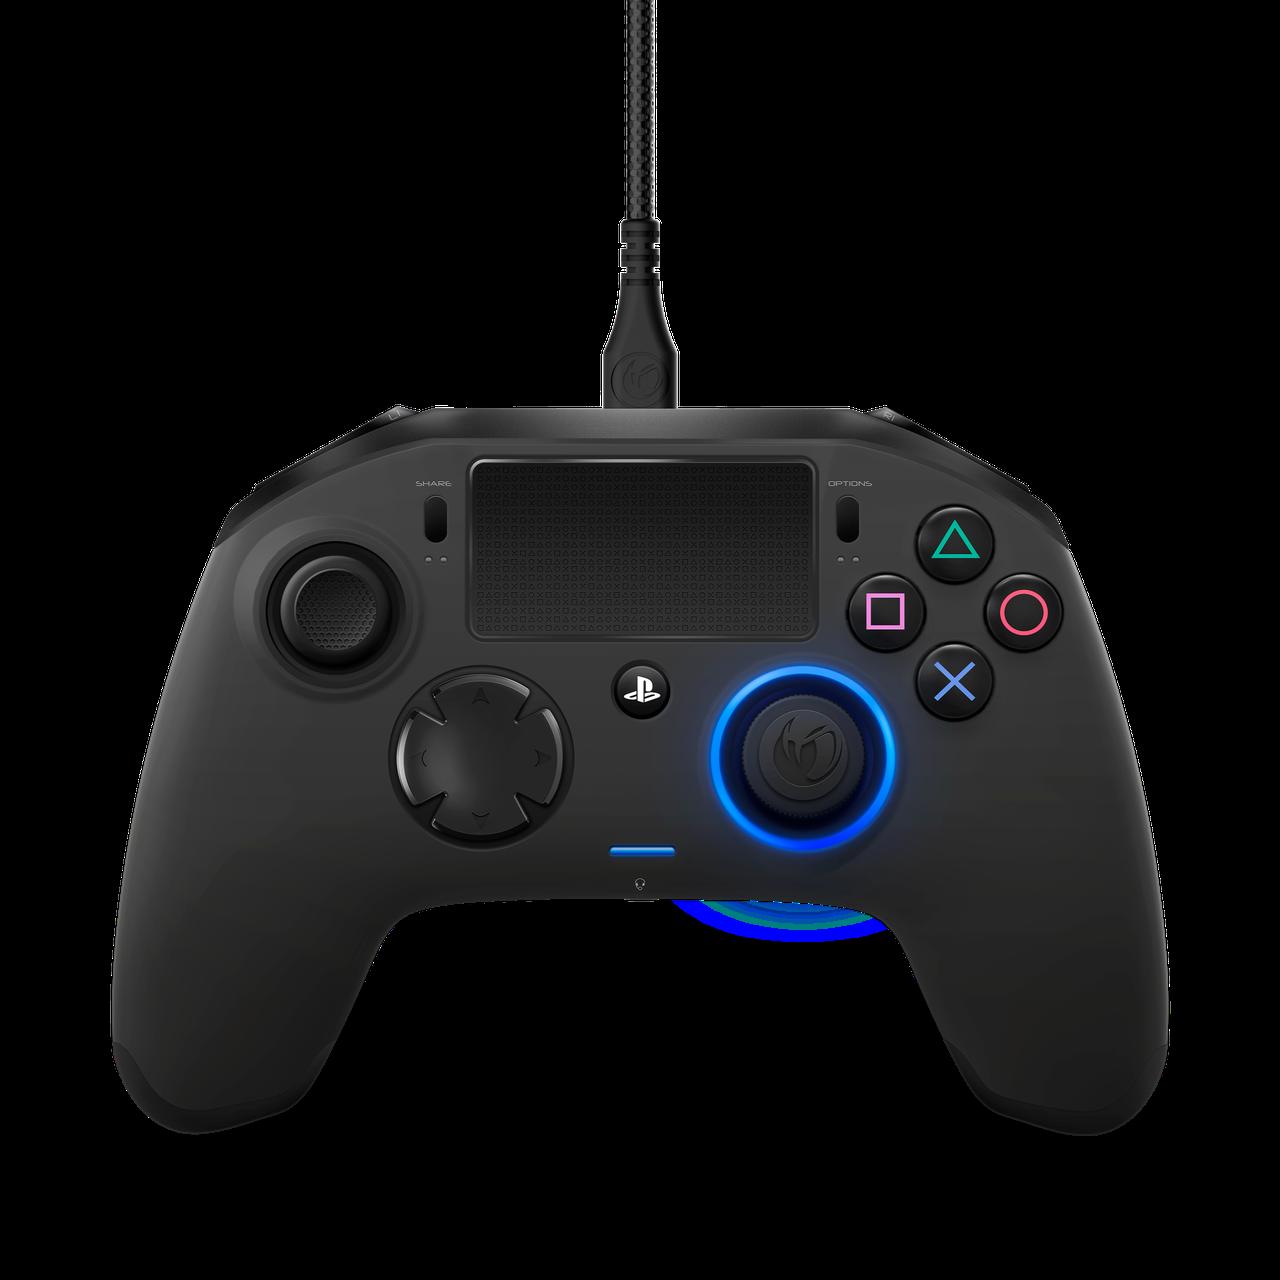 Sony PS4 Nacon Pro Controller v1